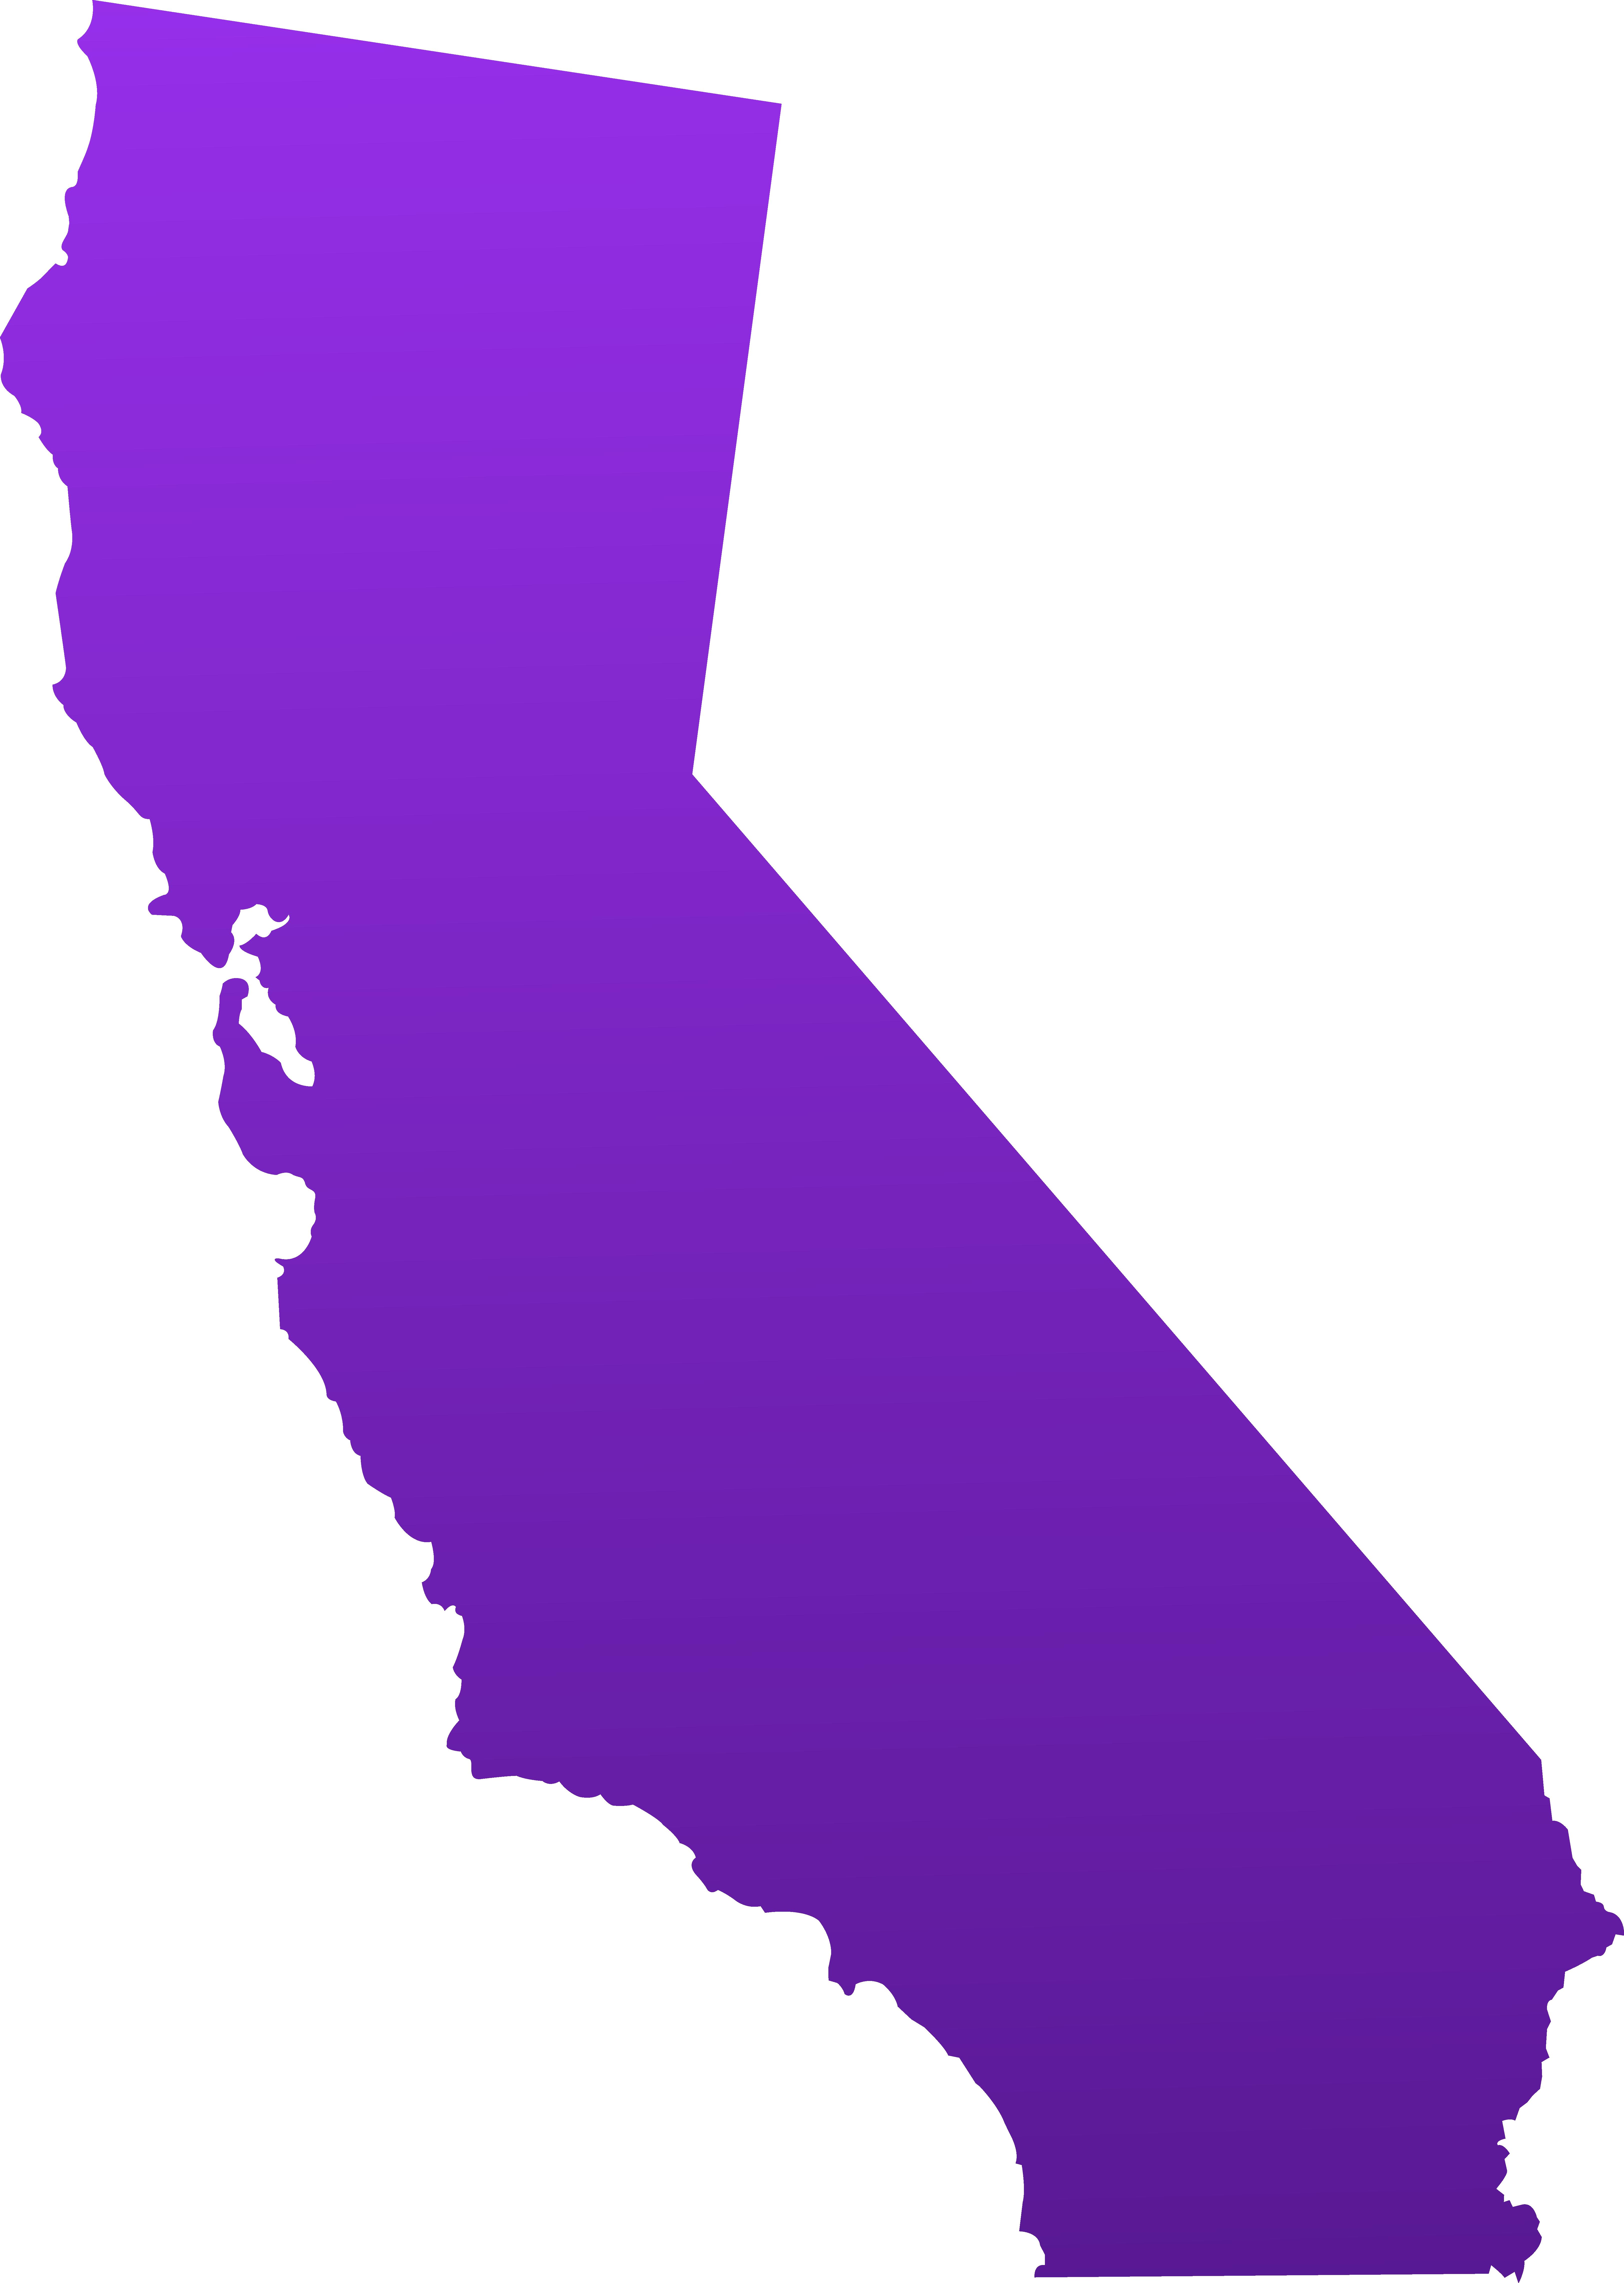 California clipart #7, Download drawings